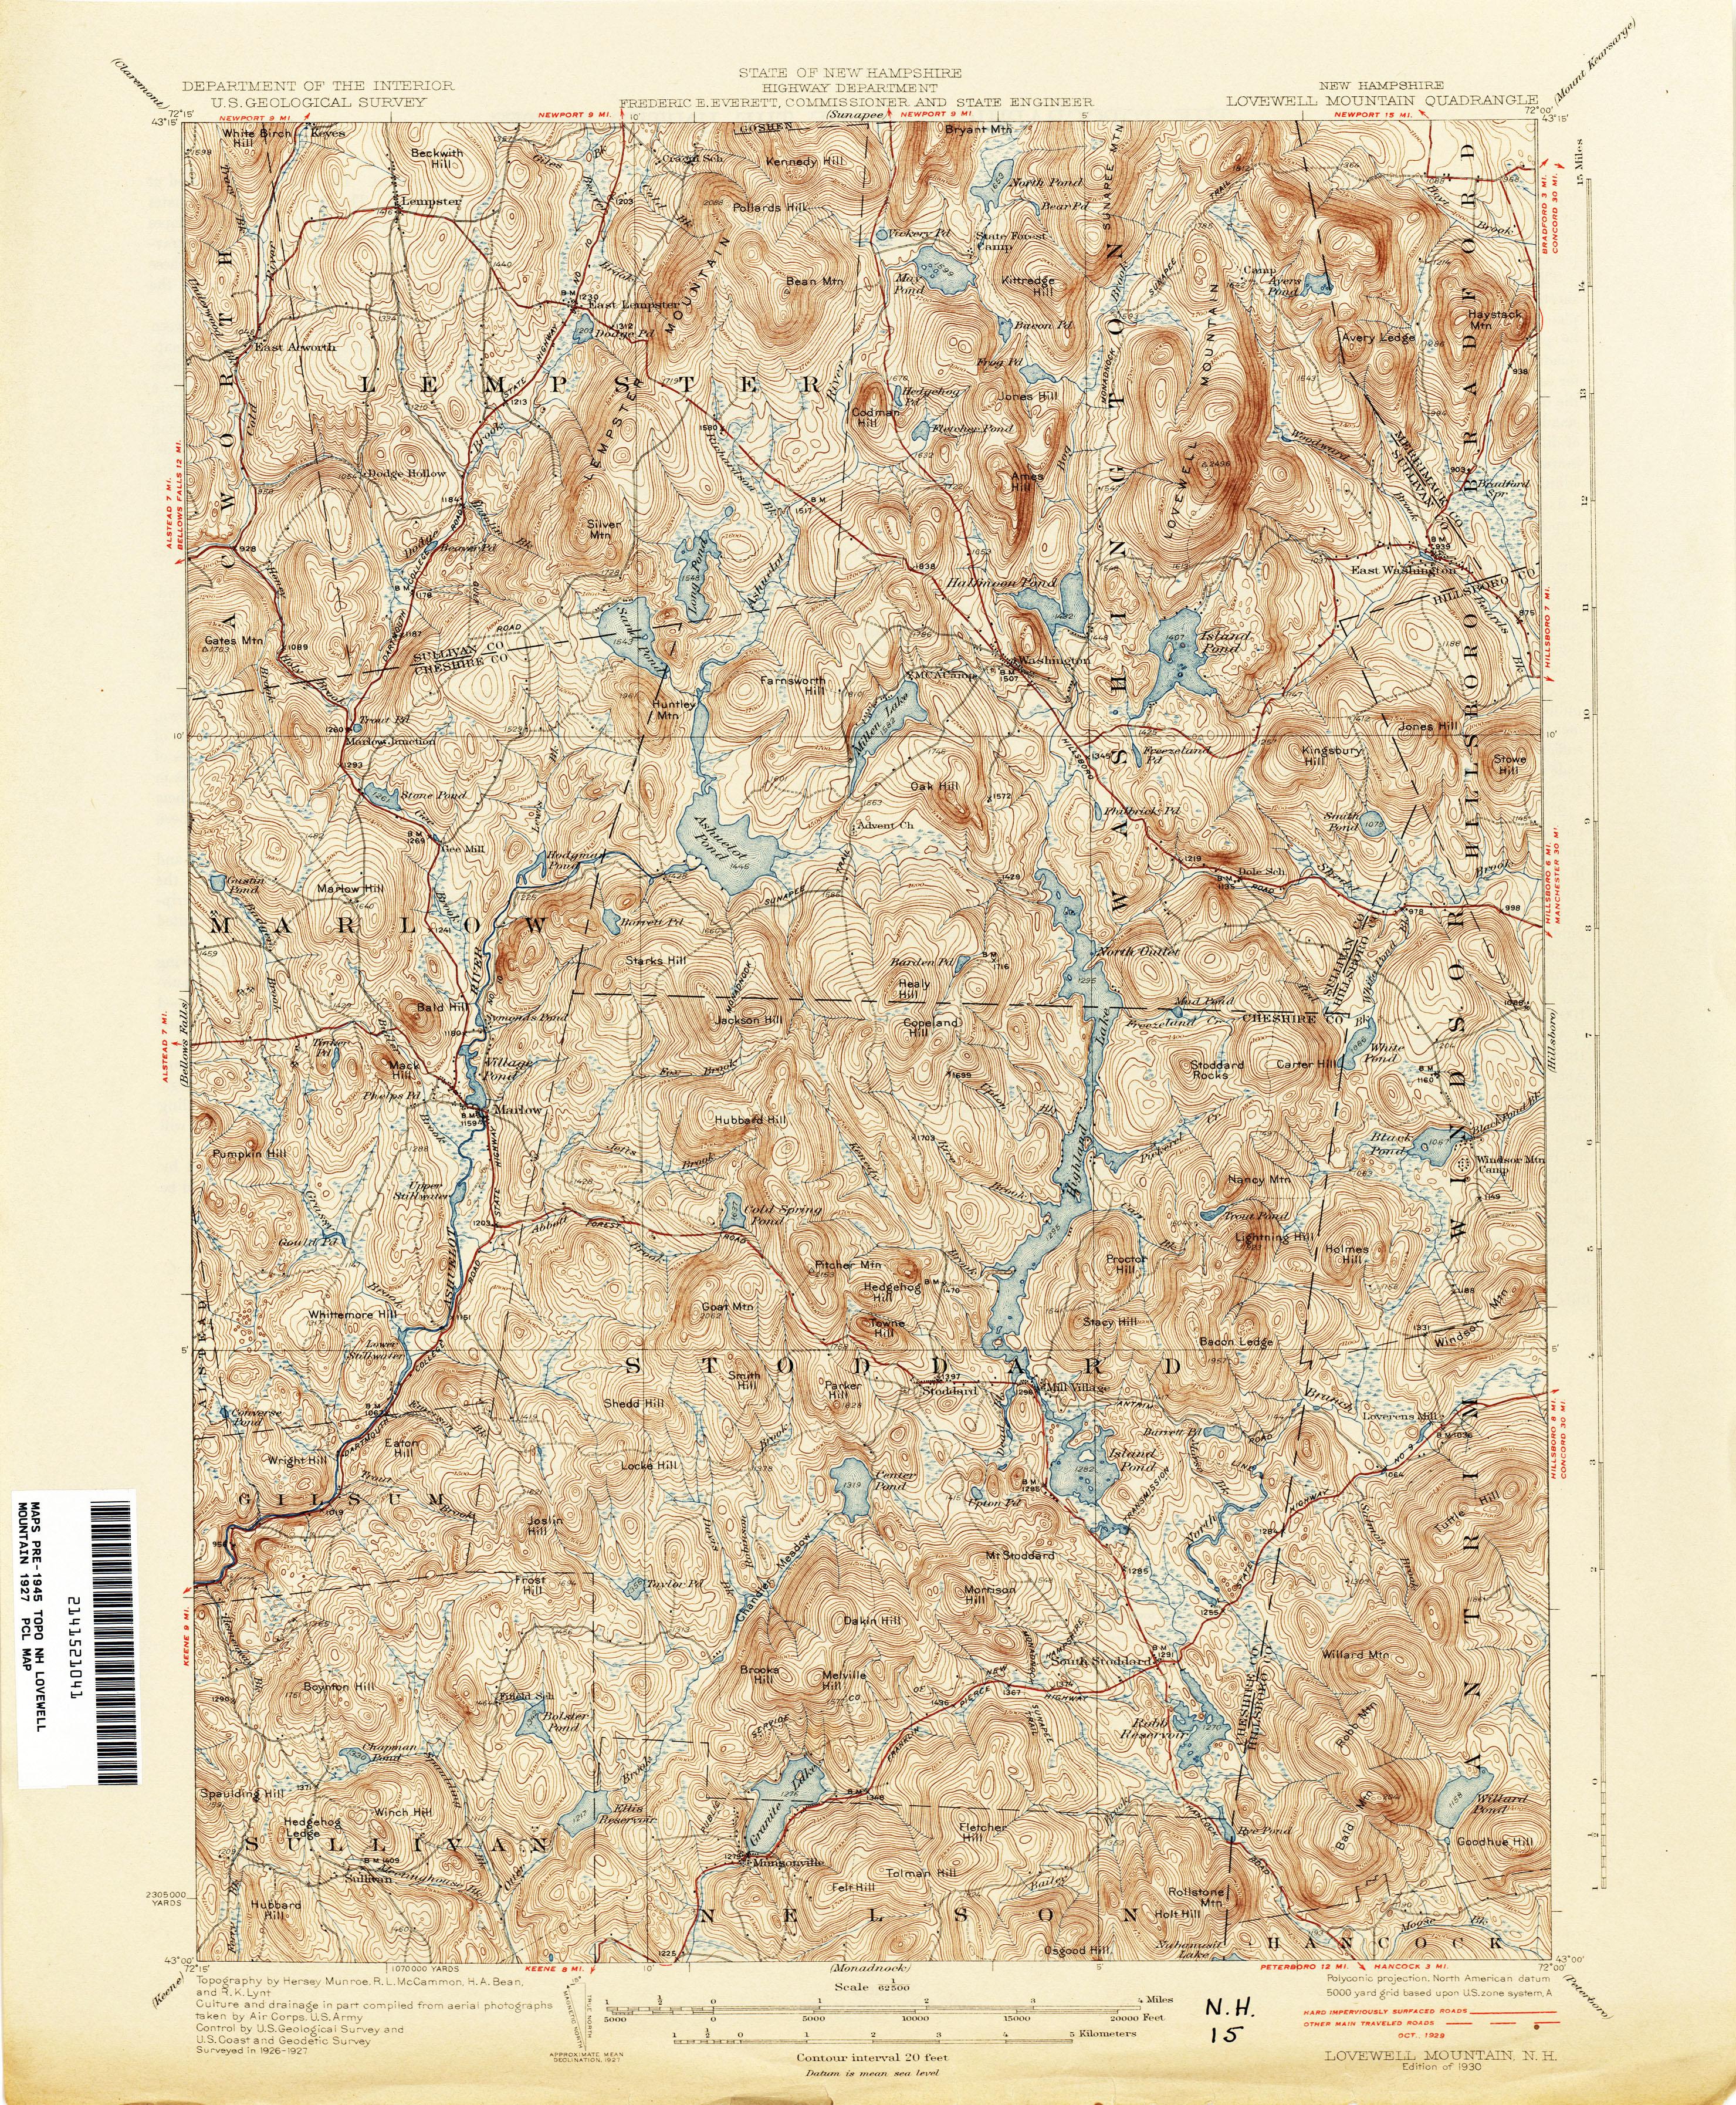 map of lebanon me, map of hollis me, map of brentwood pa, map of brentwood la, map of alford ma, map of brentwood ac, map of new hampshire, map of ogunquit me, map of brentwood ca, map of york me, water tower brentwood nh, on map of brentwood commons nh